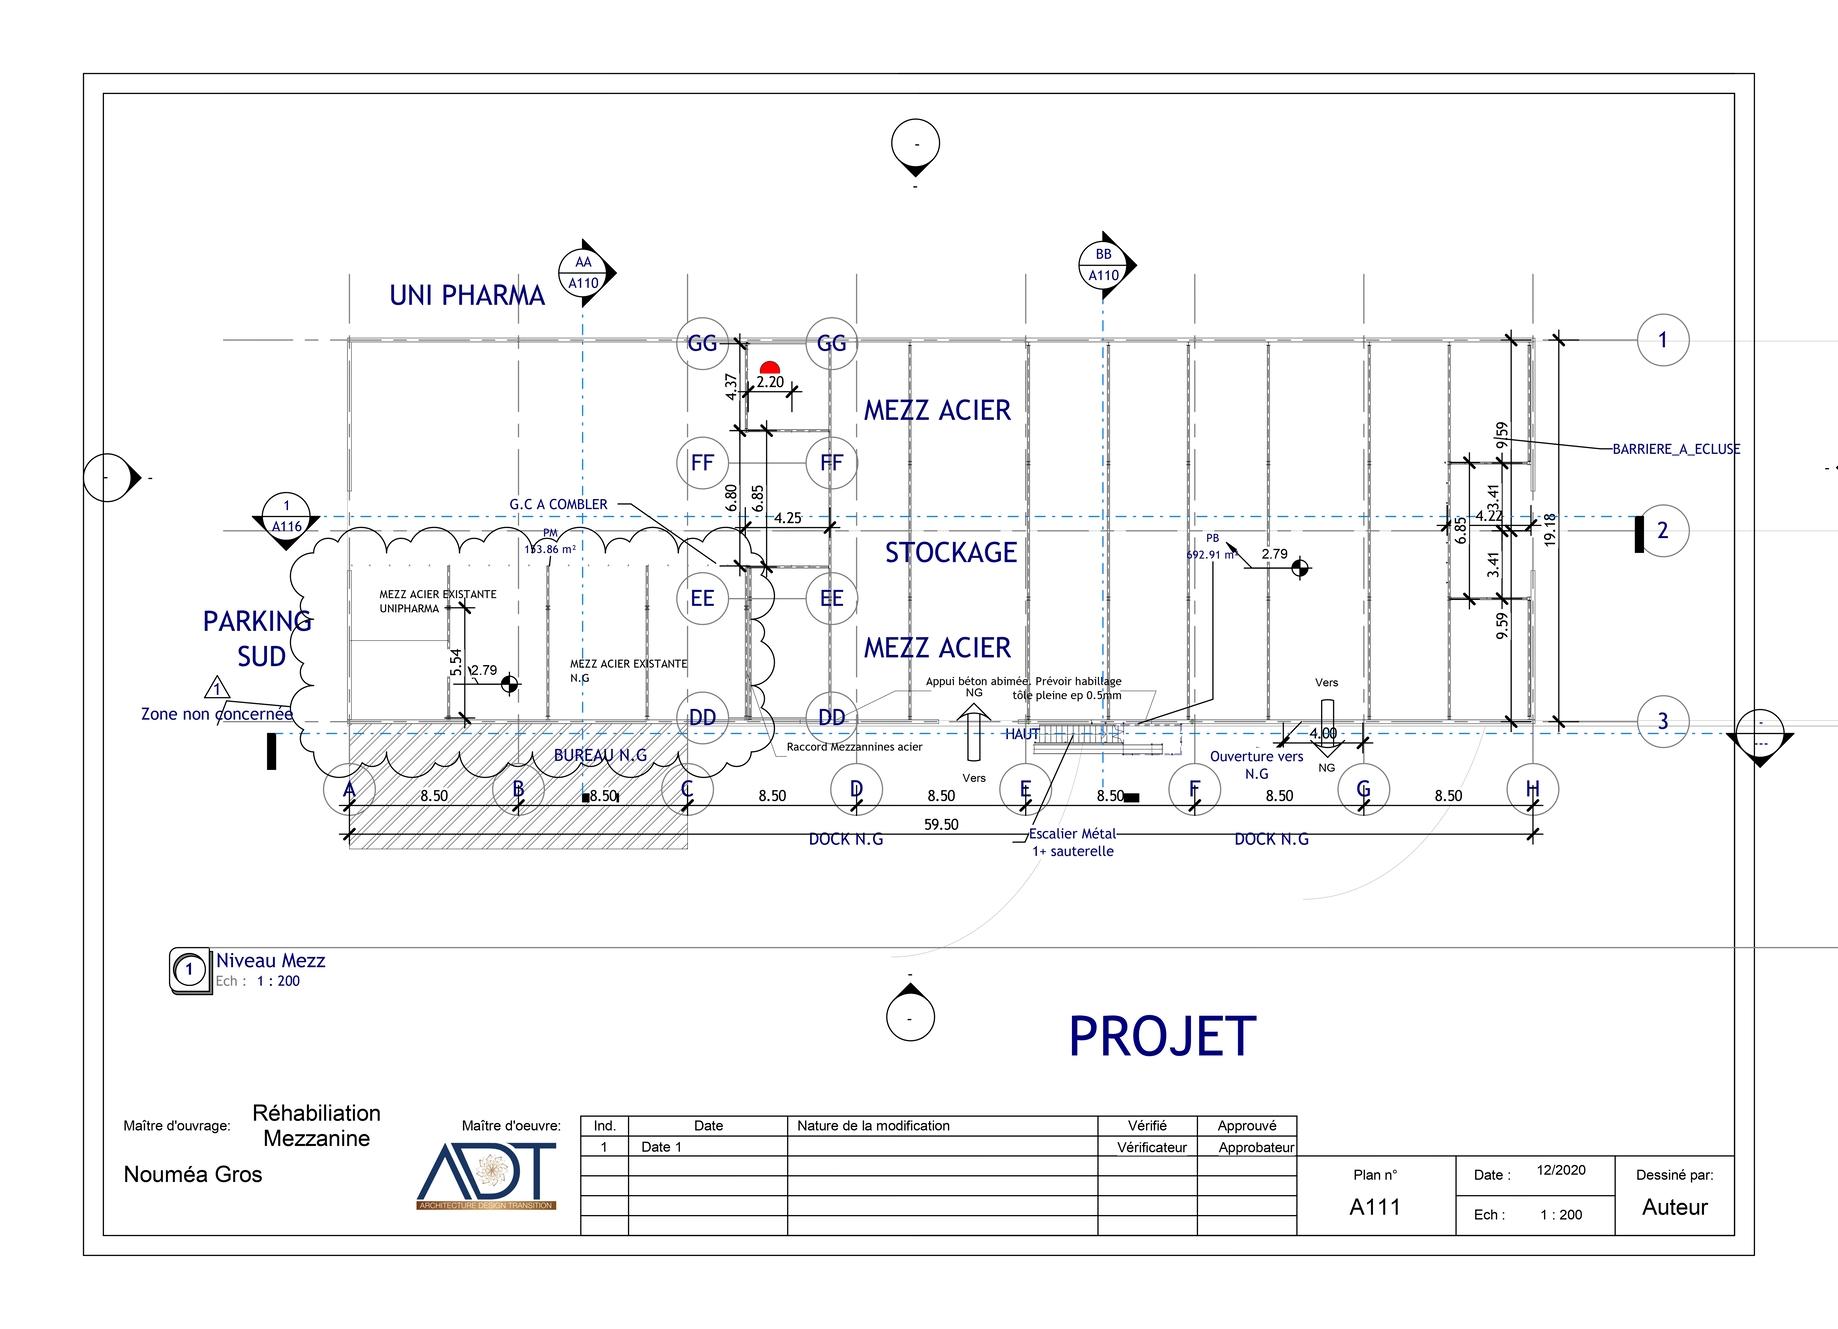 PROJET Dock NG_page-0002